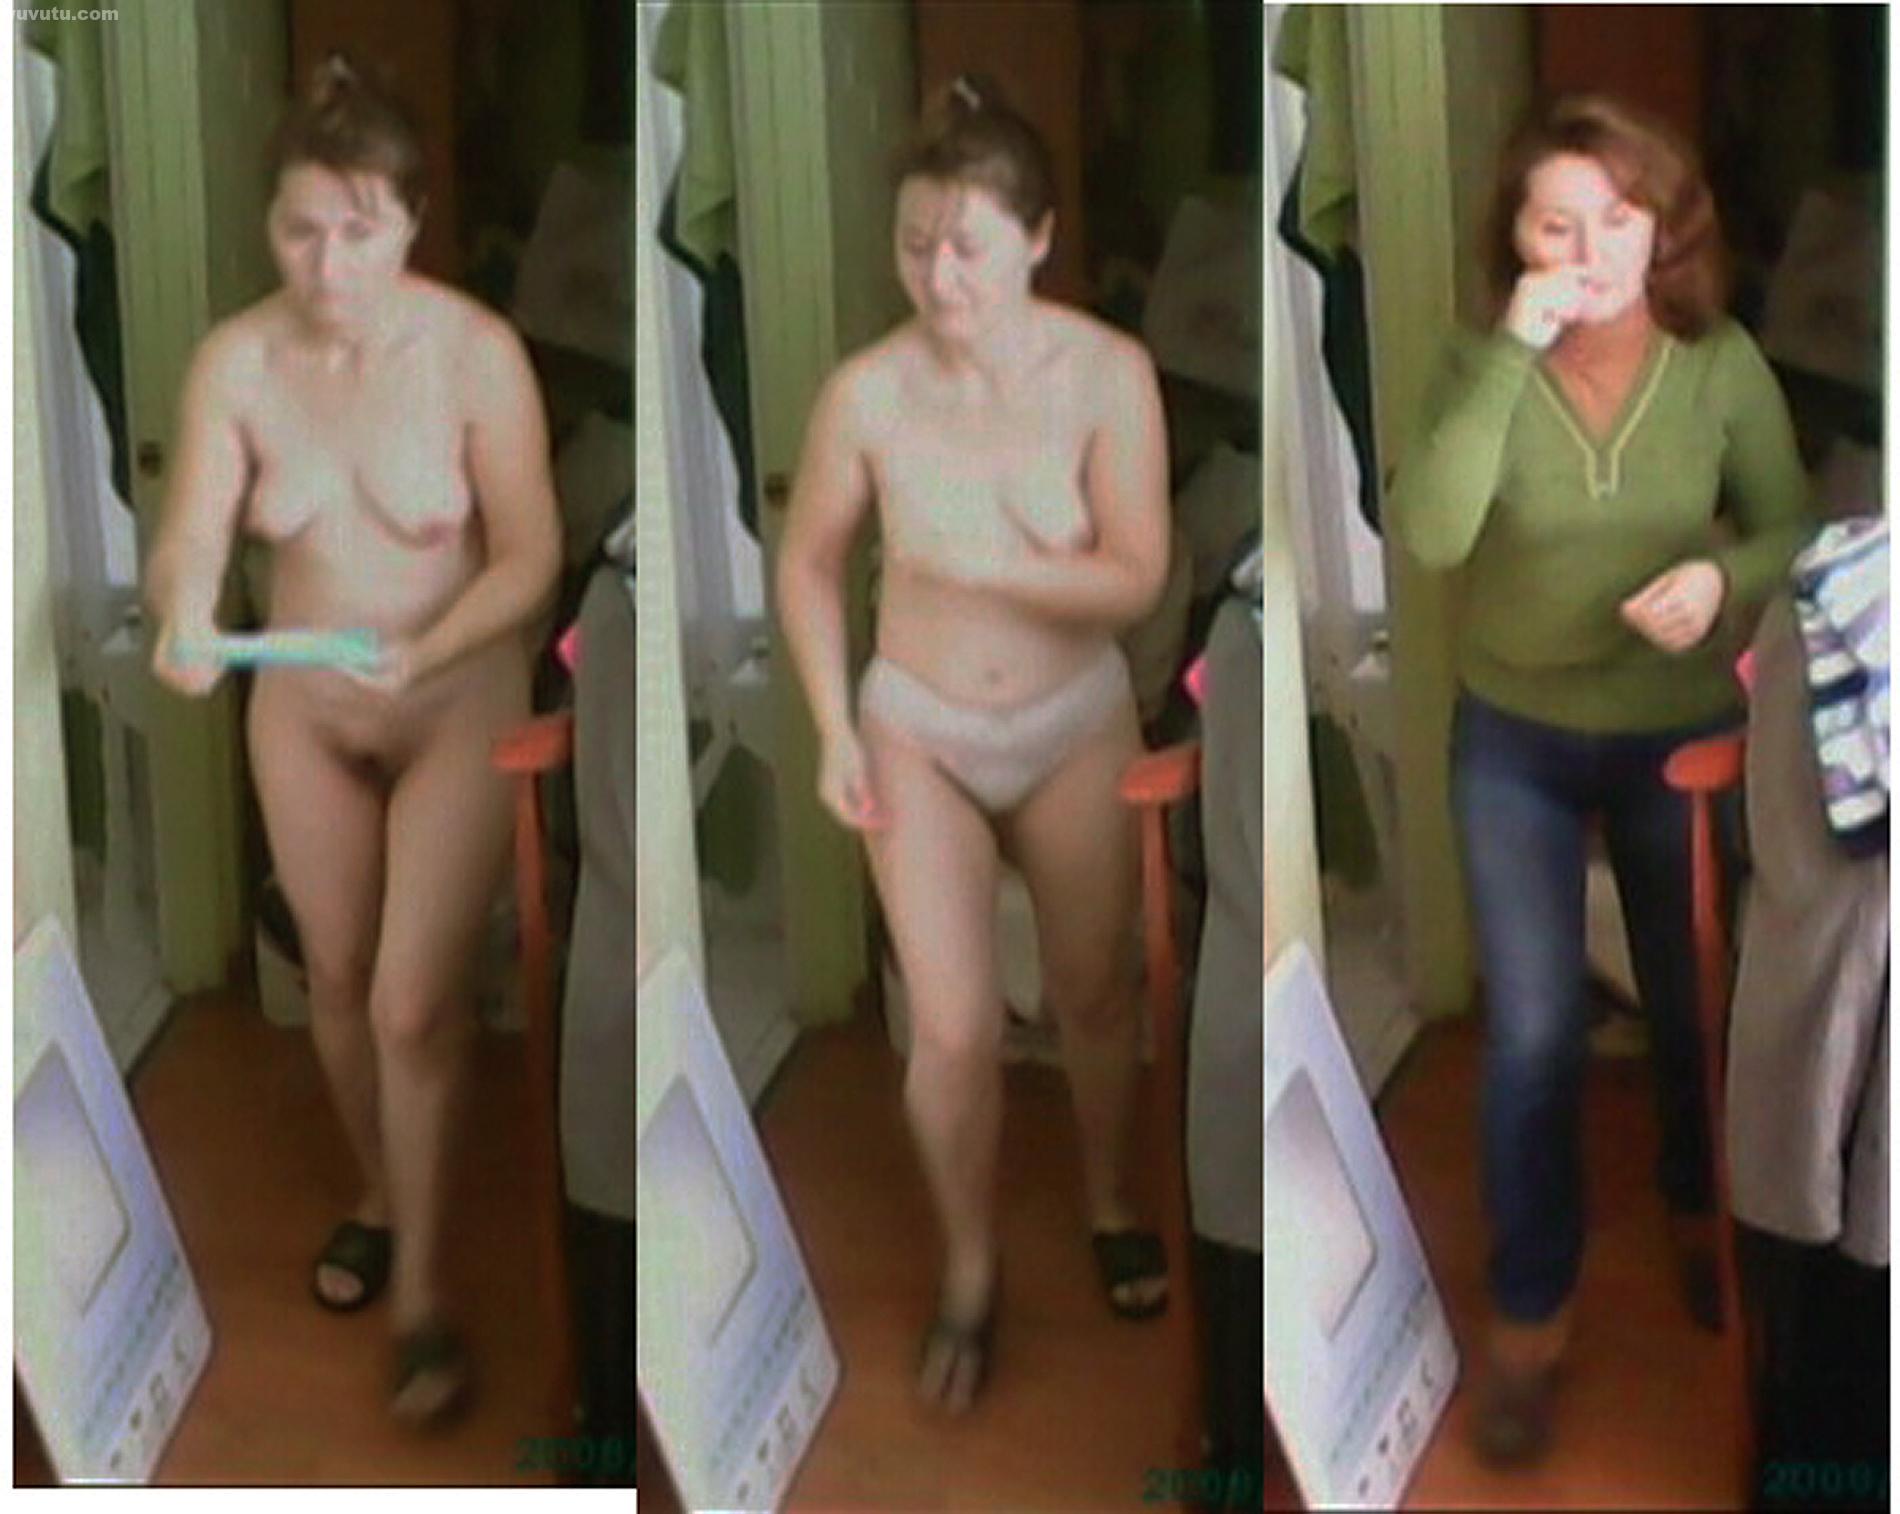 XXX image hot neighbor sex on hidden cam